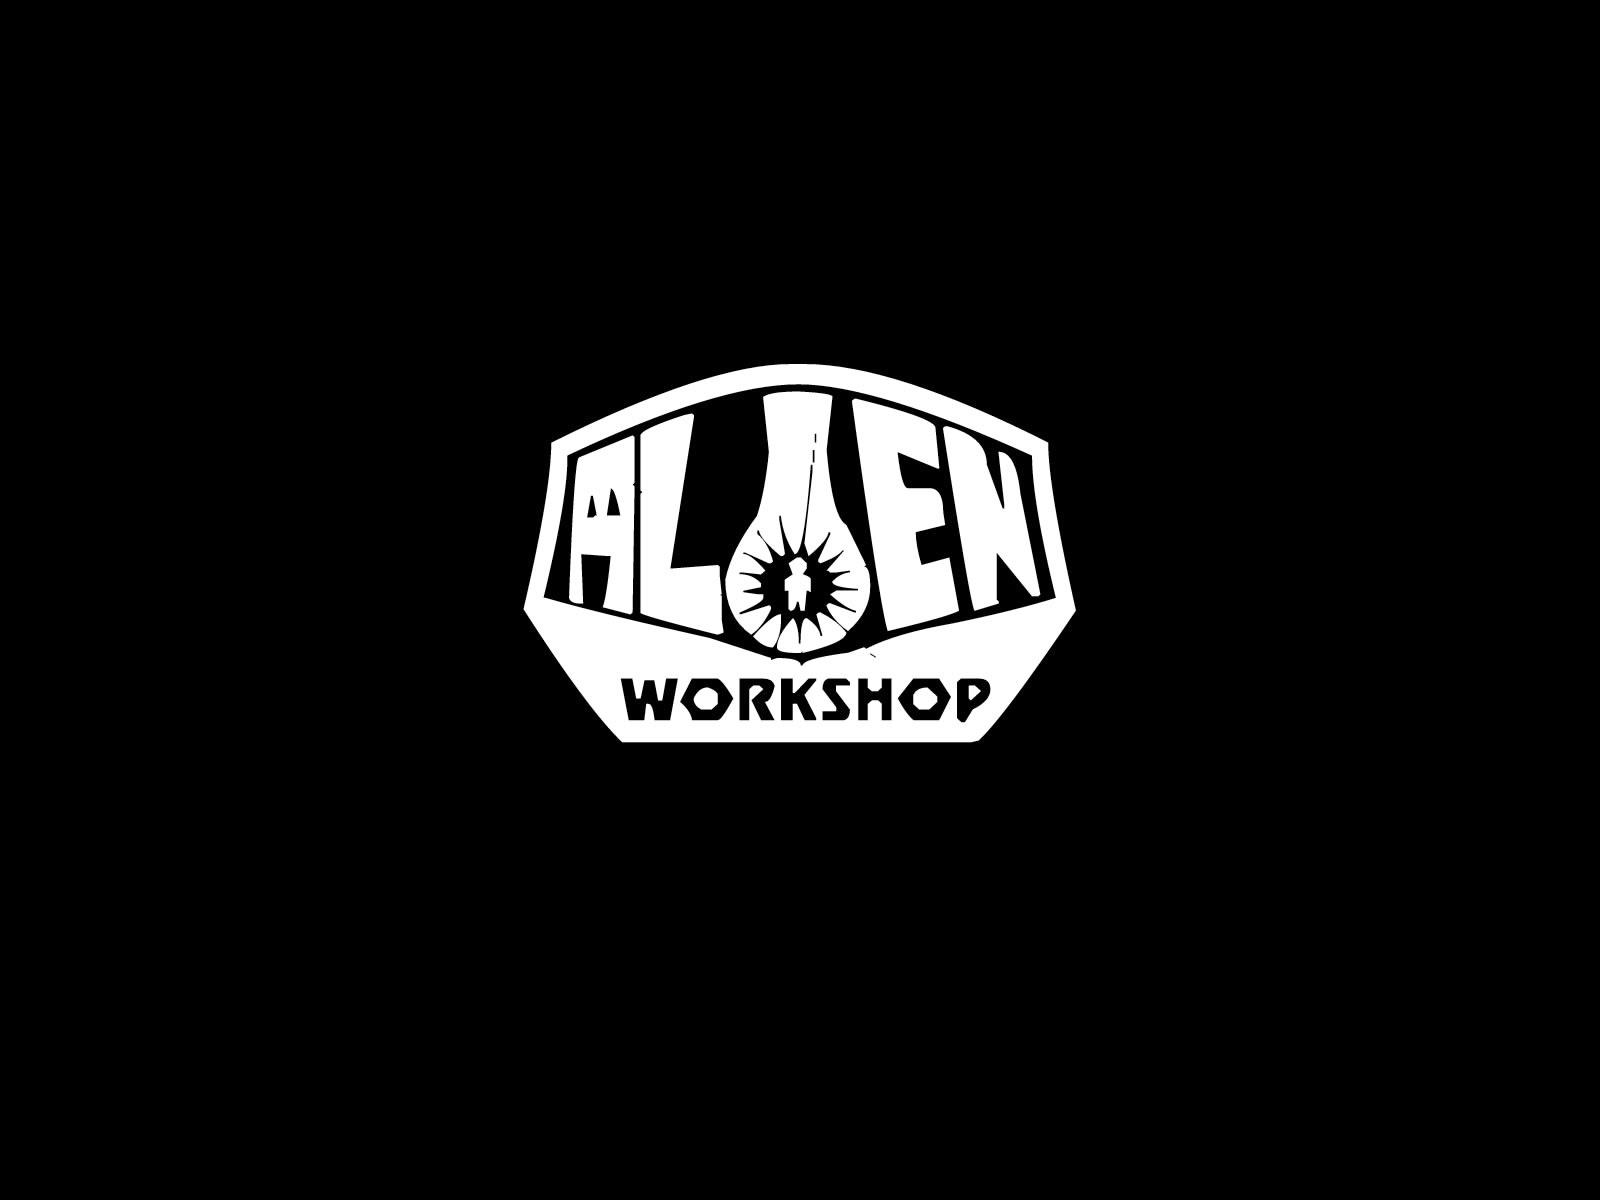 alien workshop wallpaper - photo #8